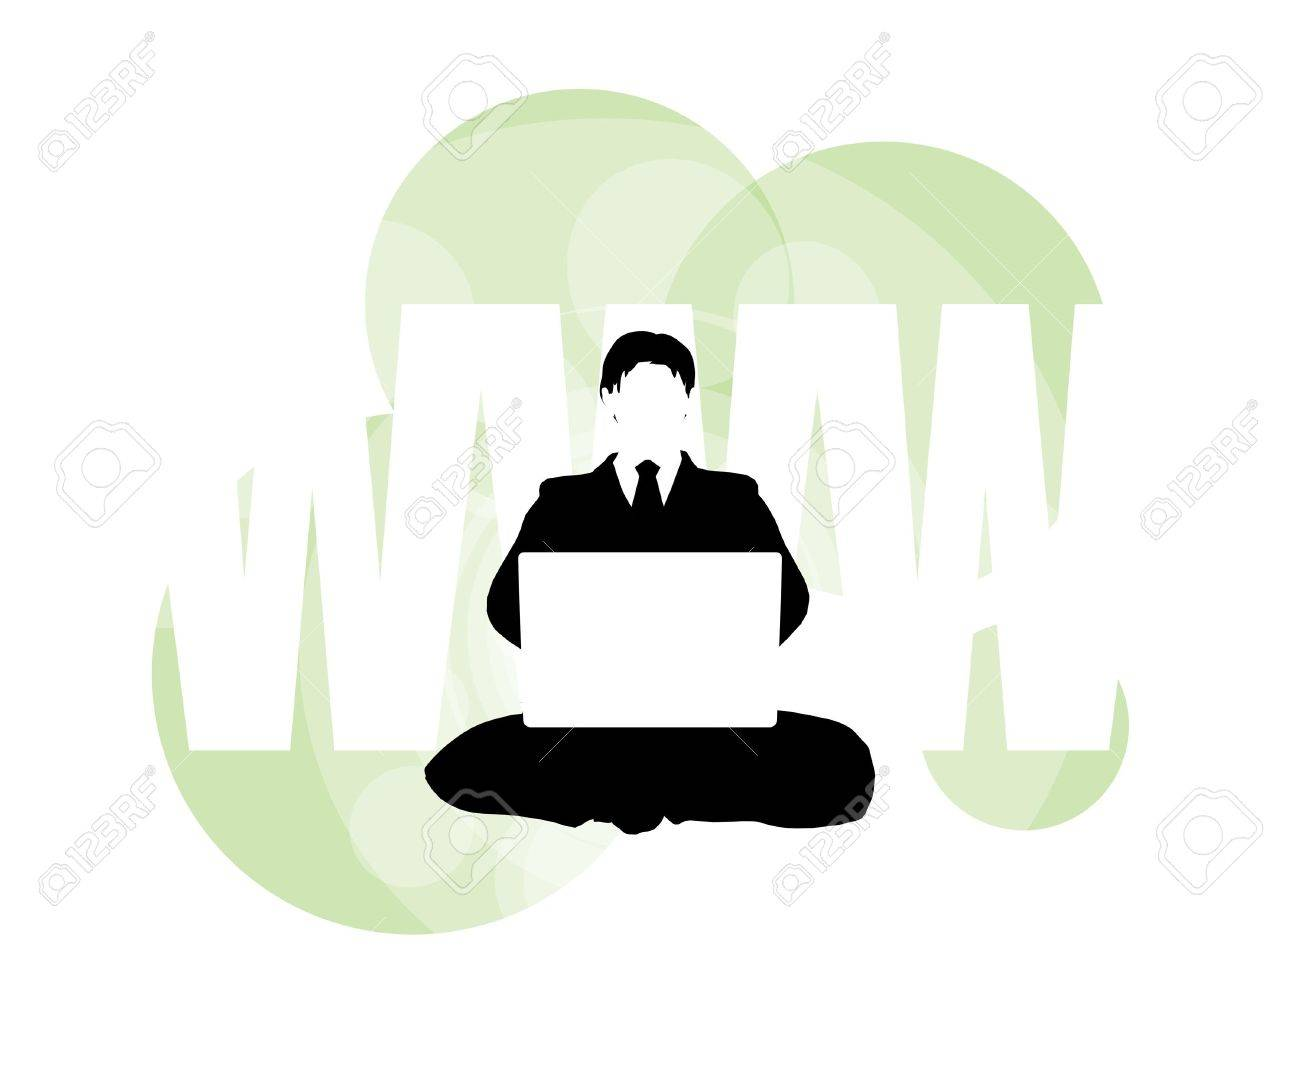 3D illustration of businessman on laptop against WWW background - 5826376